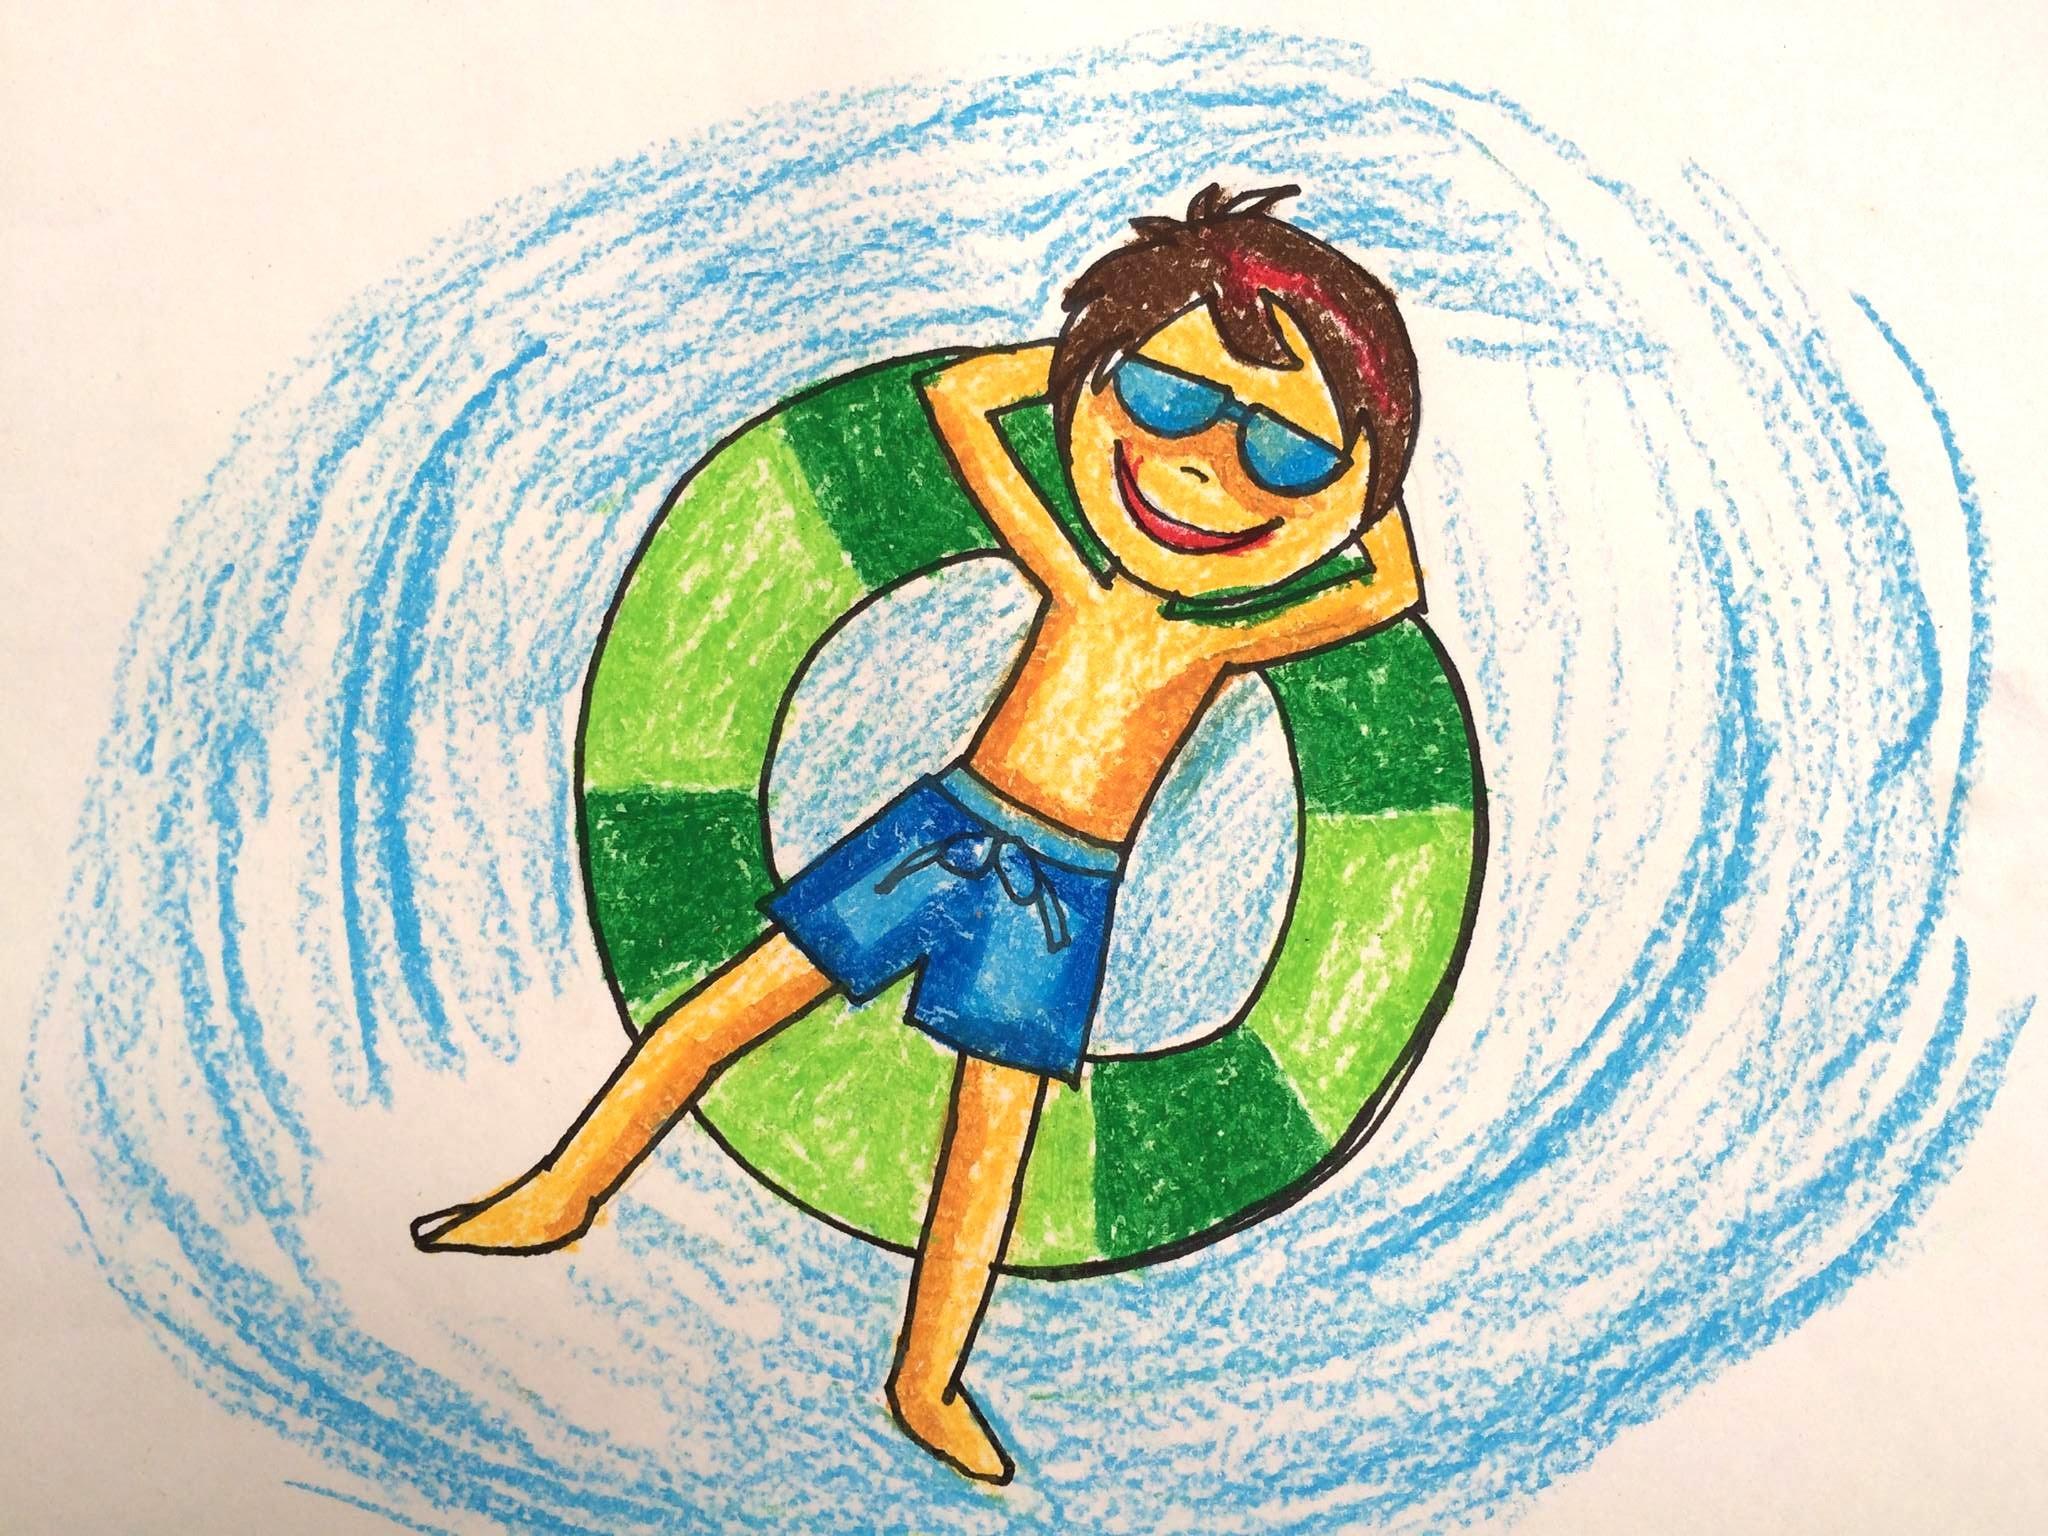 Painting summer for kids | How to draw swimming pool fun | Bé tập vẽ bể bÆ¡i  2 | Art for kids – YouTube